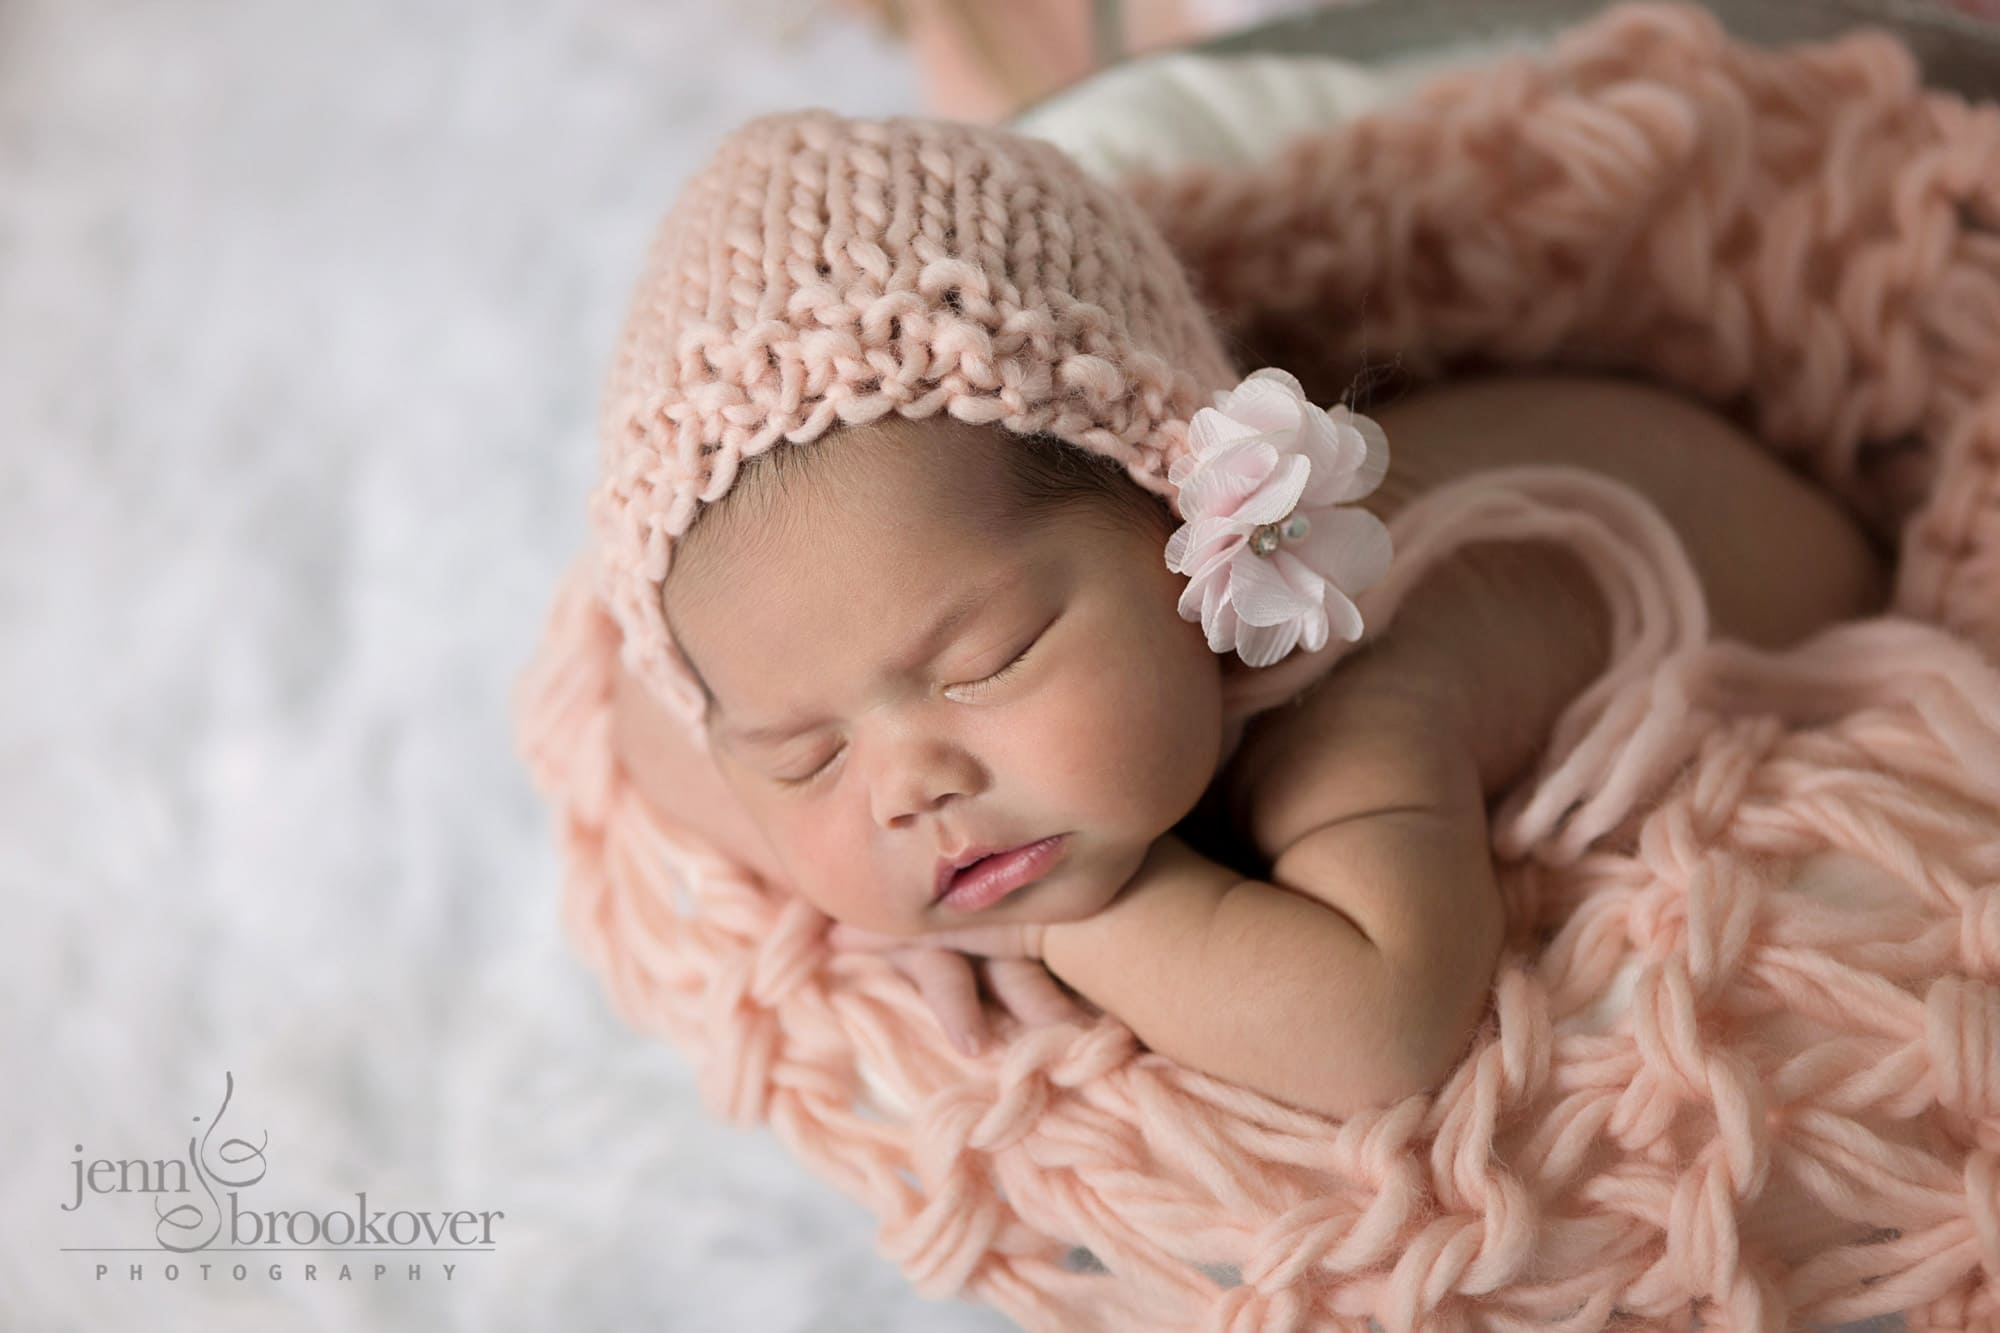 newborn in a handmade hat peach snuggled up for her newborn portrait session taken by Jenn Brookover in San Antonio, Texas